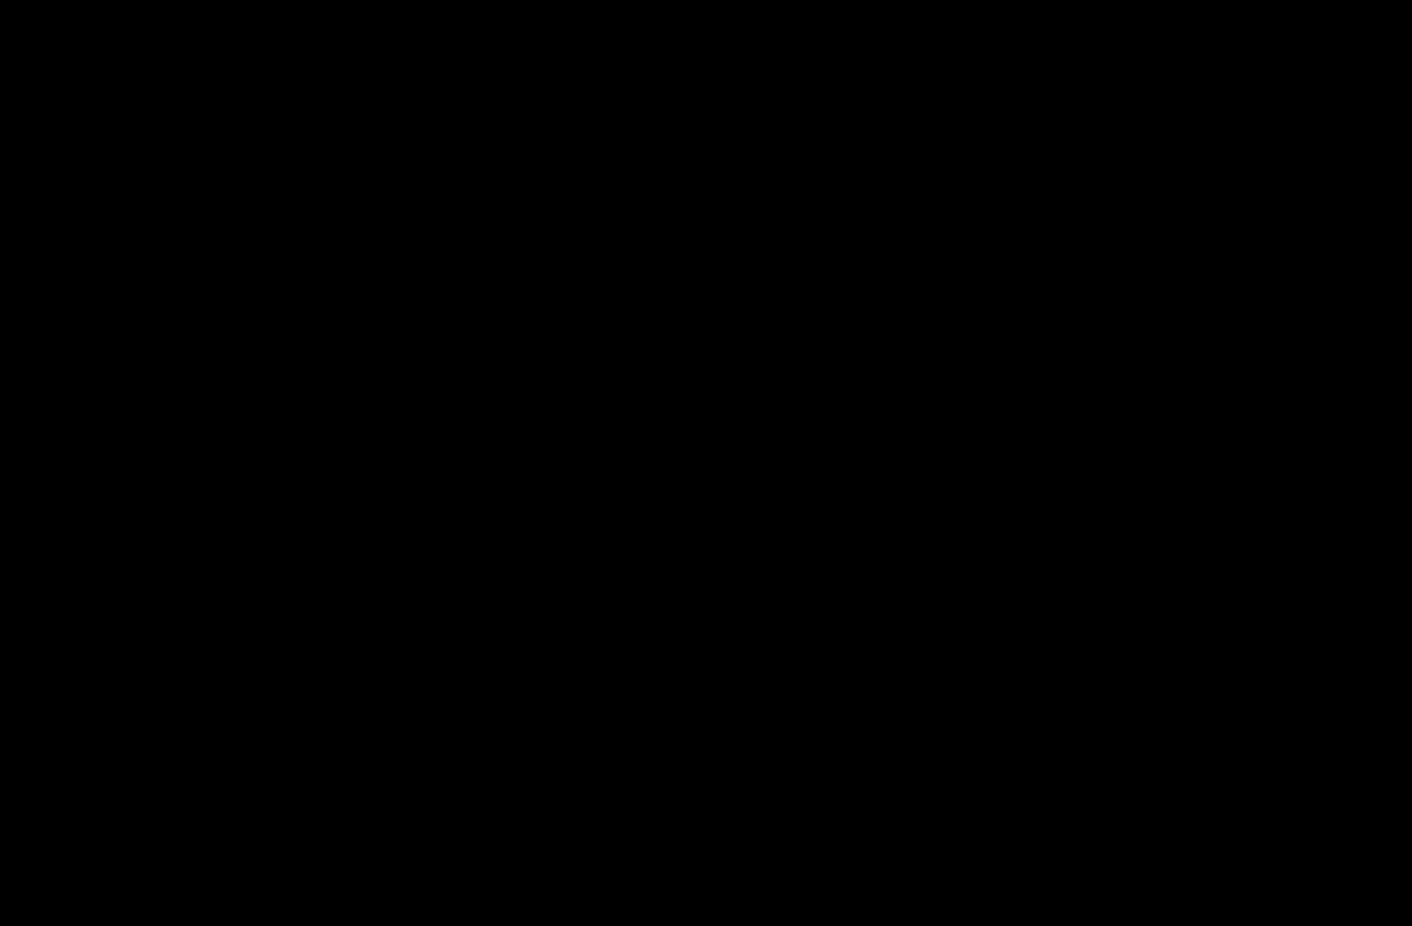 ouija board png